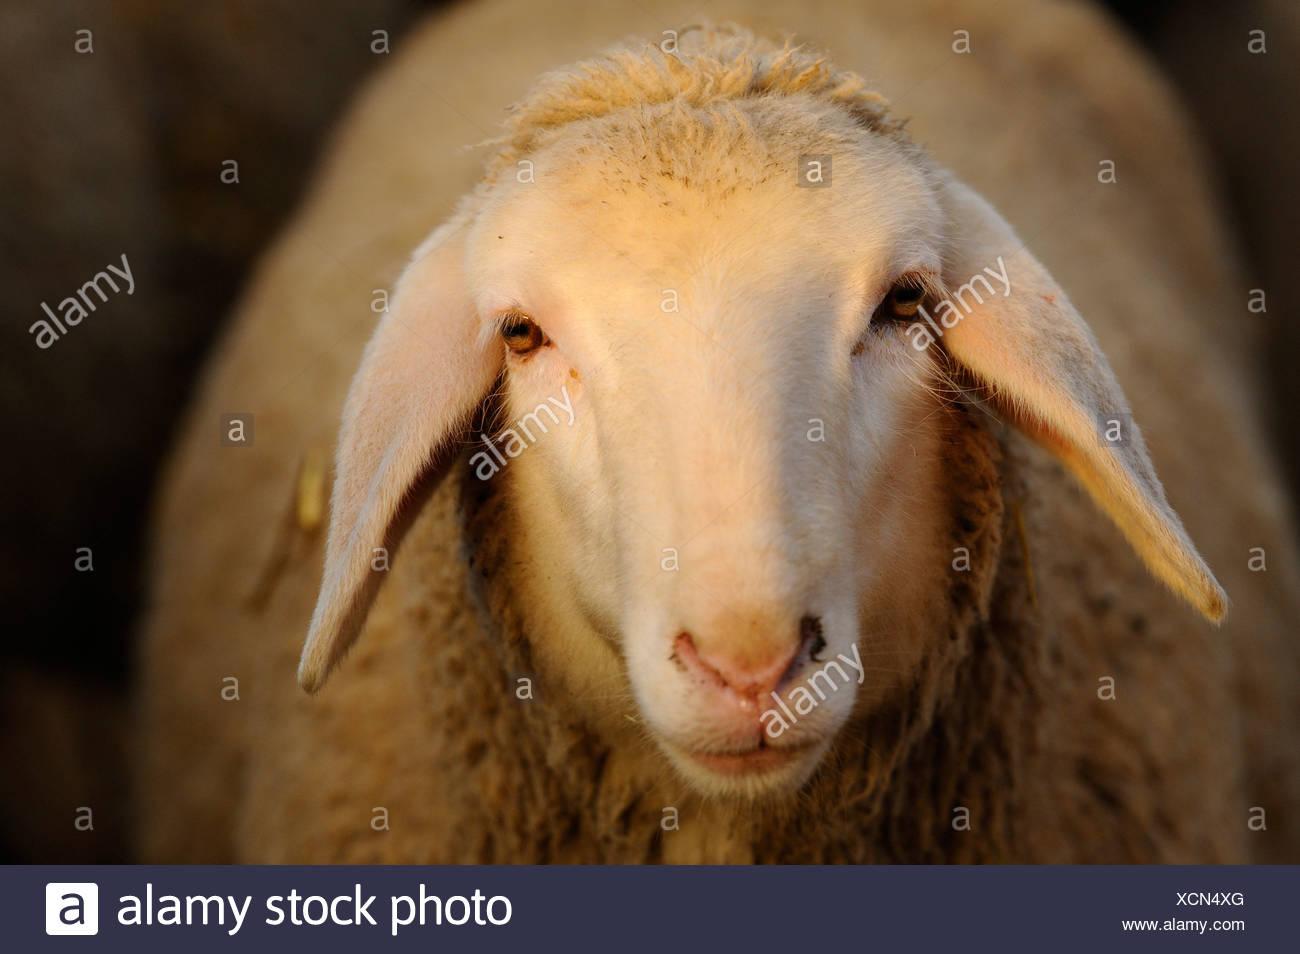 Merino sheep, portrait - Stock Image